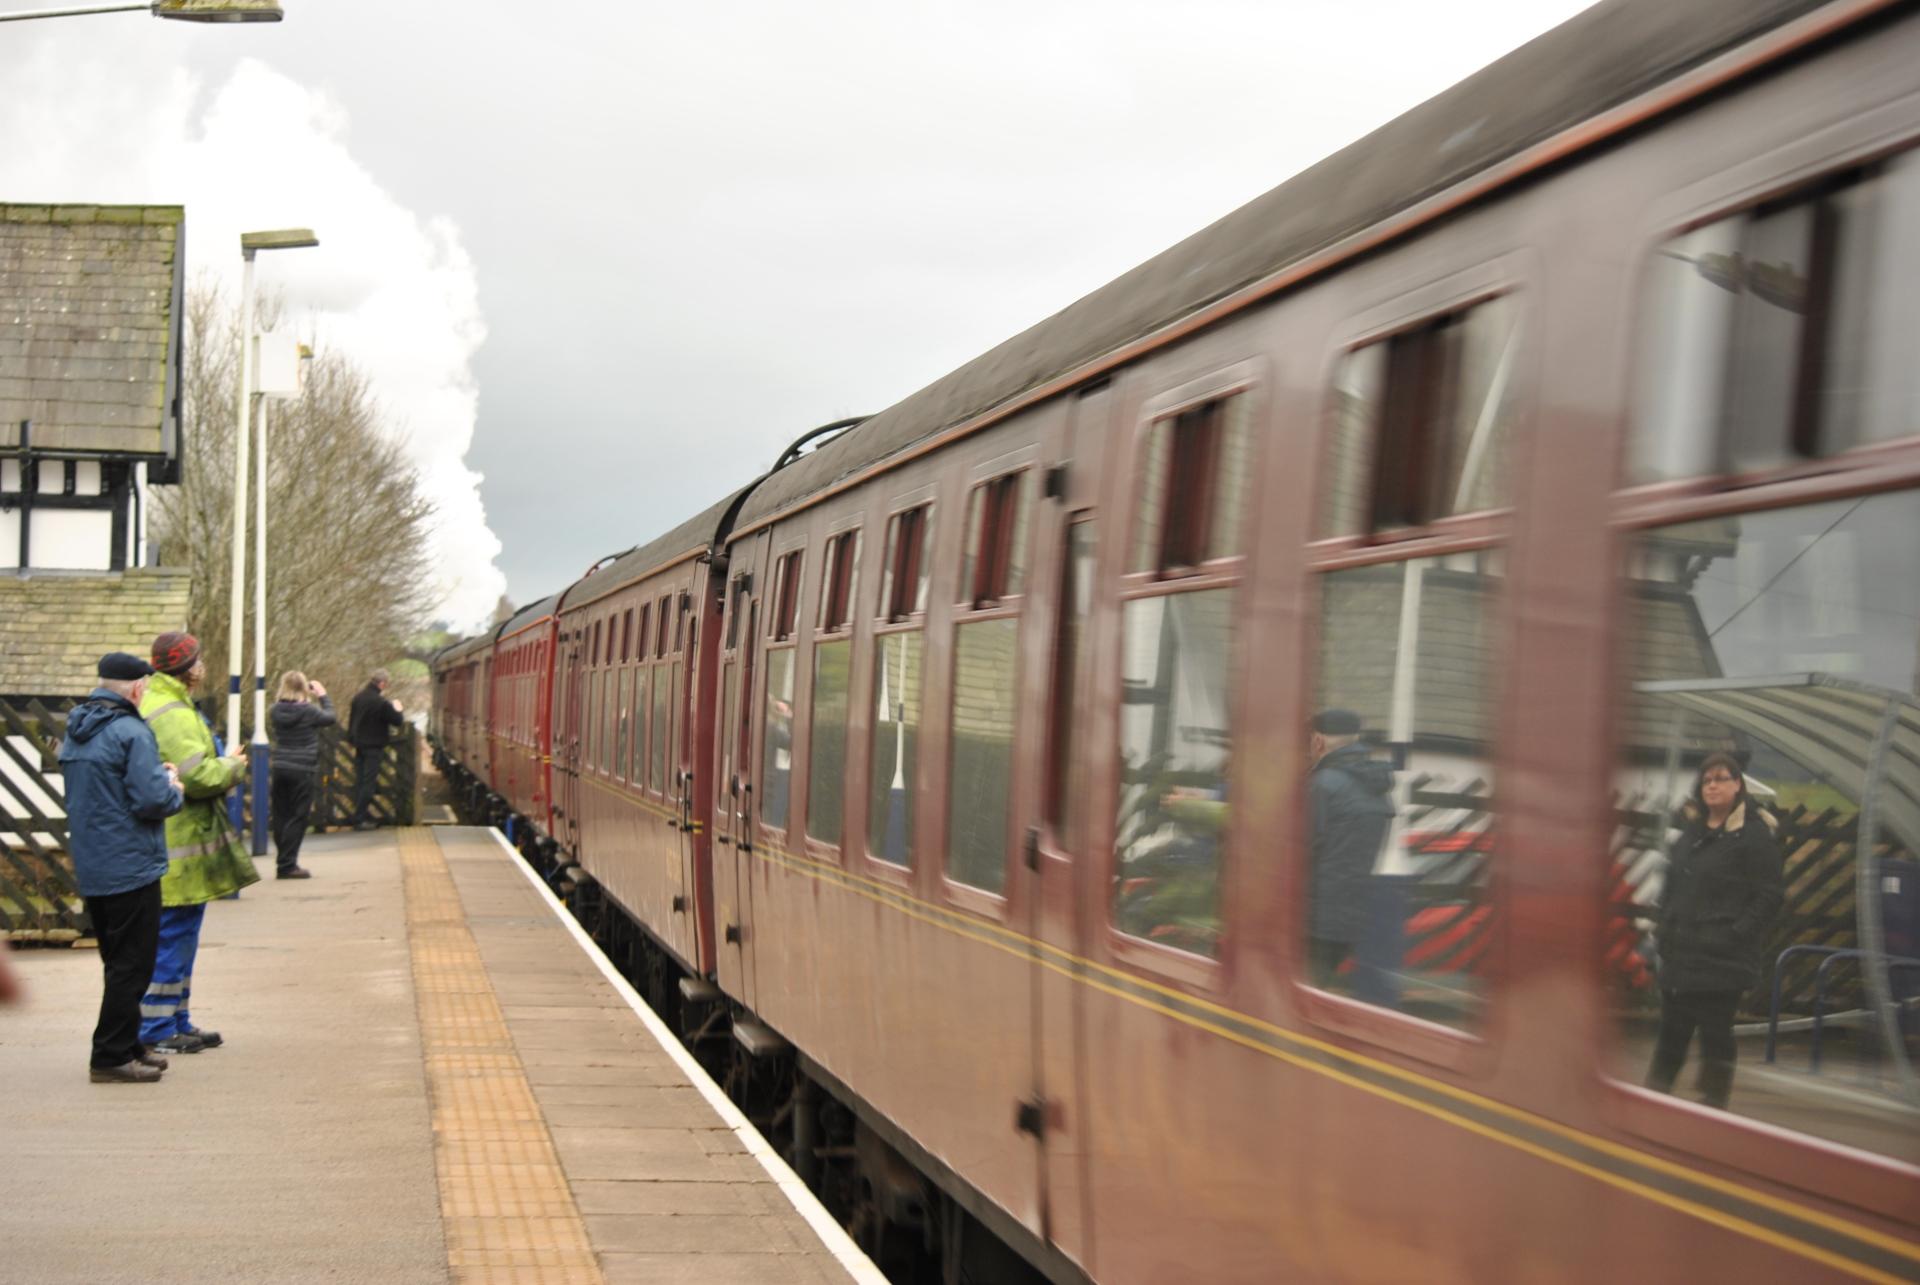 Flying Scotsman, steam train